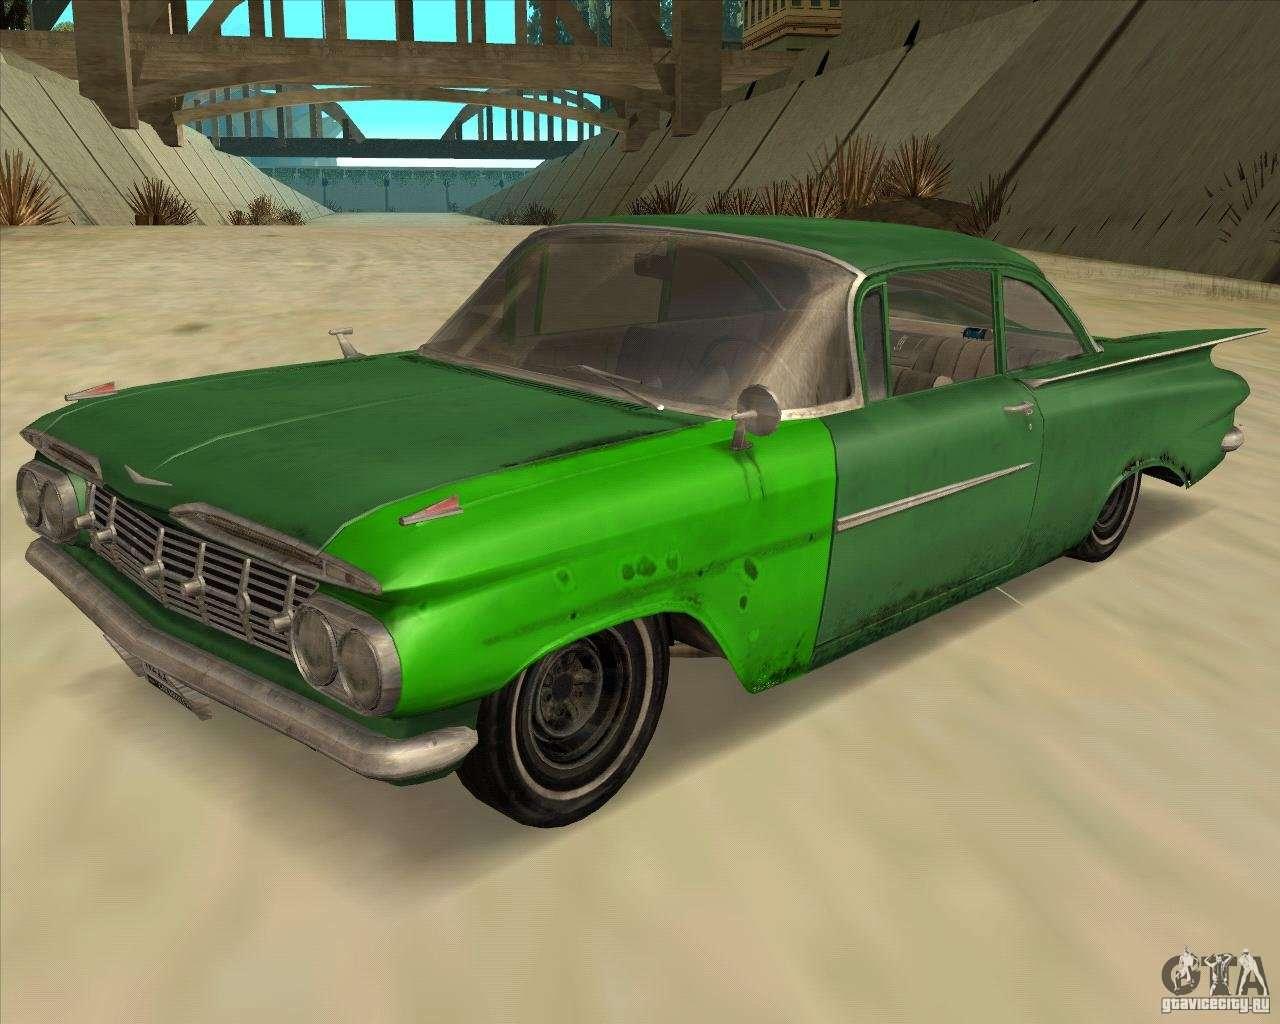 Chevrolet impala 4 door hardtop 1963 for gta san andreas - Chevrolet Biscayne 1959 For Gta San Andreas